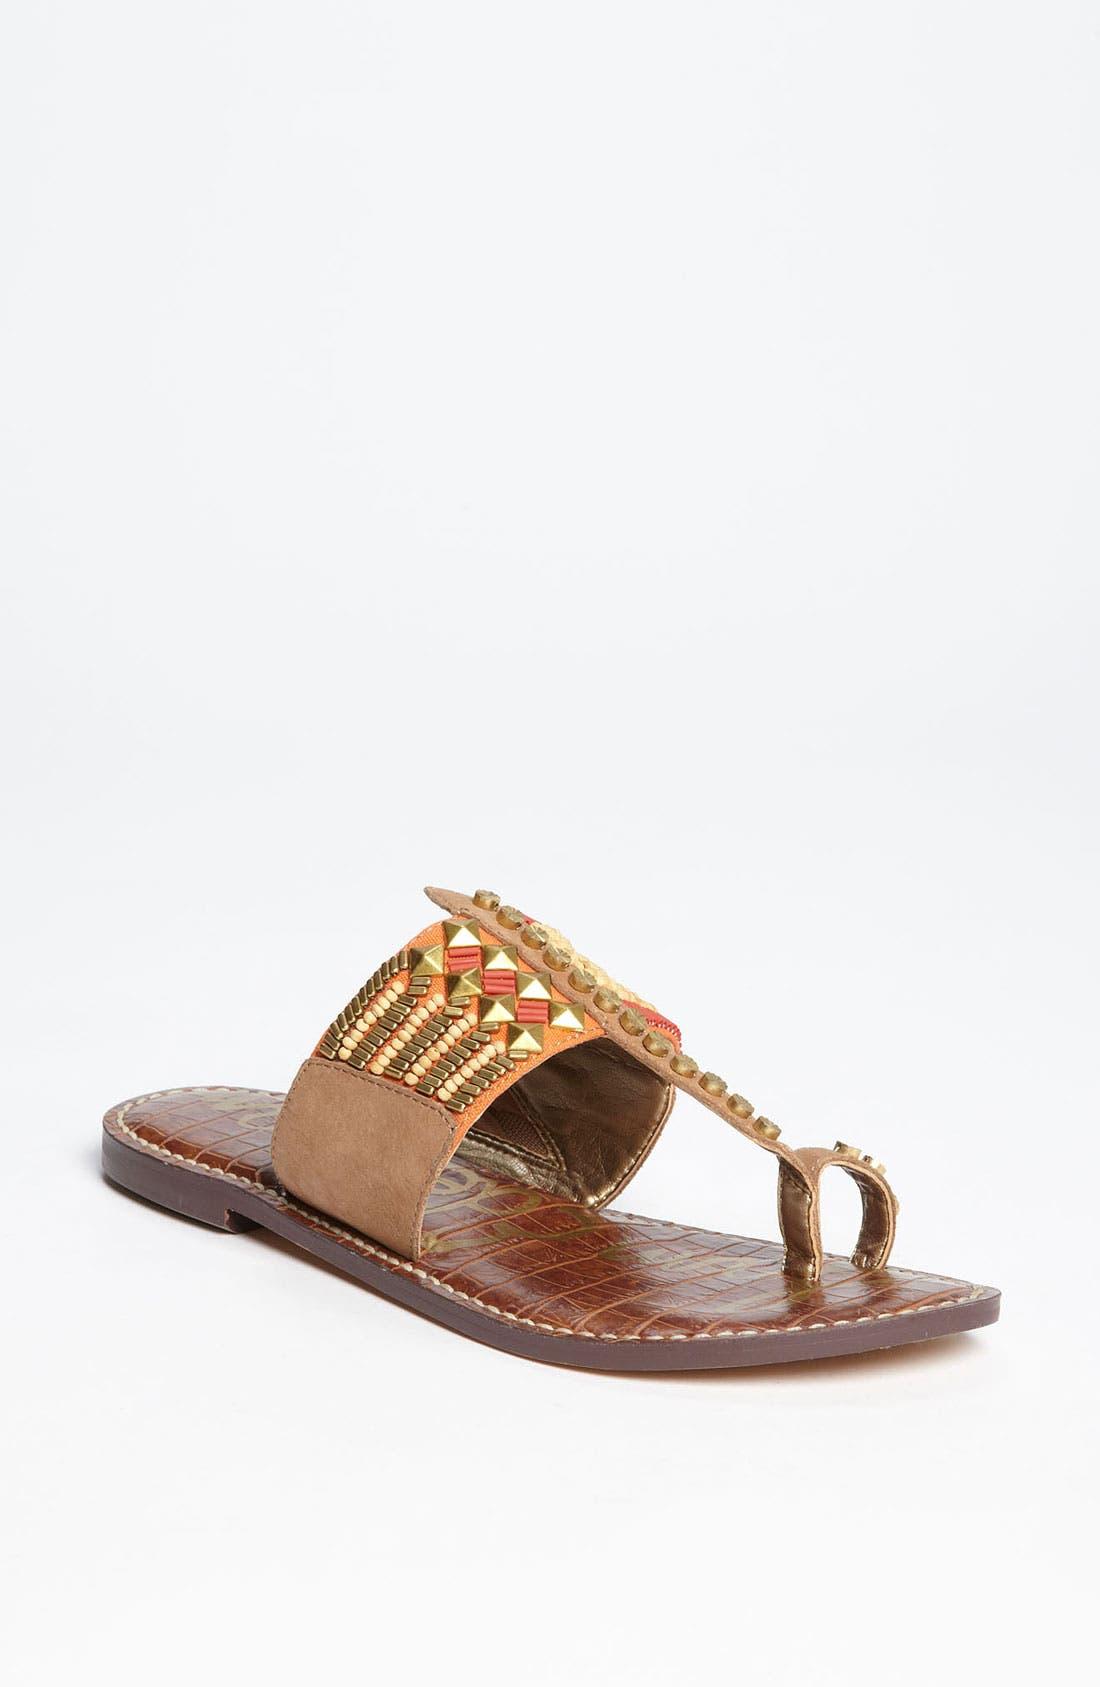 Alternate Image 1 Selected - Sam Edelman 'Gideon' Sandal